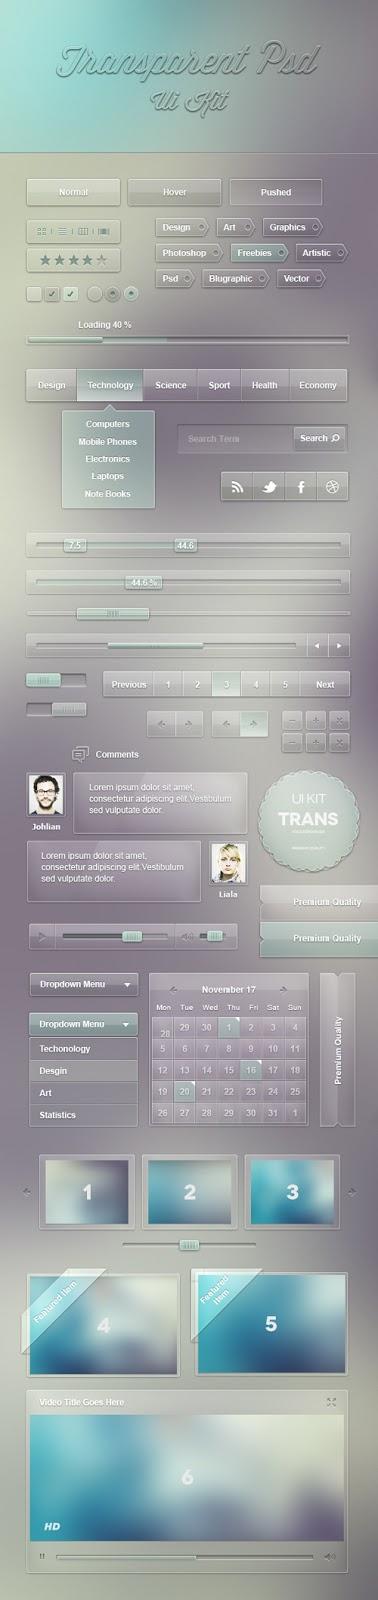 https://1.bp.blogspot.com/-EVylMGfJJvA/UexIUoEZ4eI/AAAAAAAASOk/H_ShiNFdxgc/s1600/Transparent-Ui-Kit-Psd.jpg